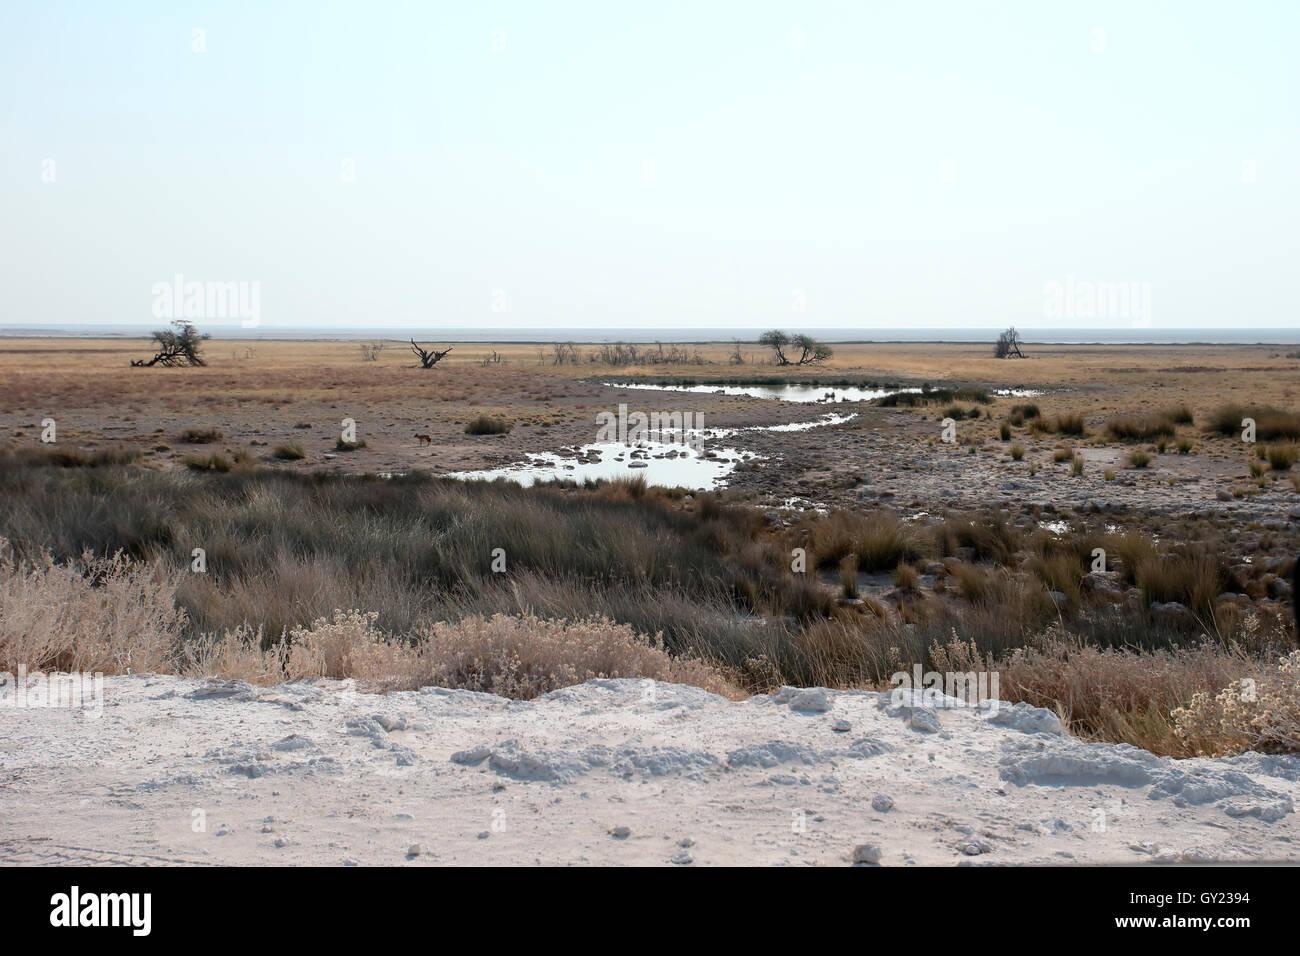 Parc National d'Etosha, Namibie, août 2016 Photo Stock